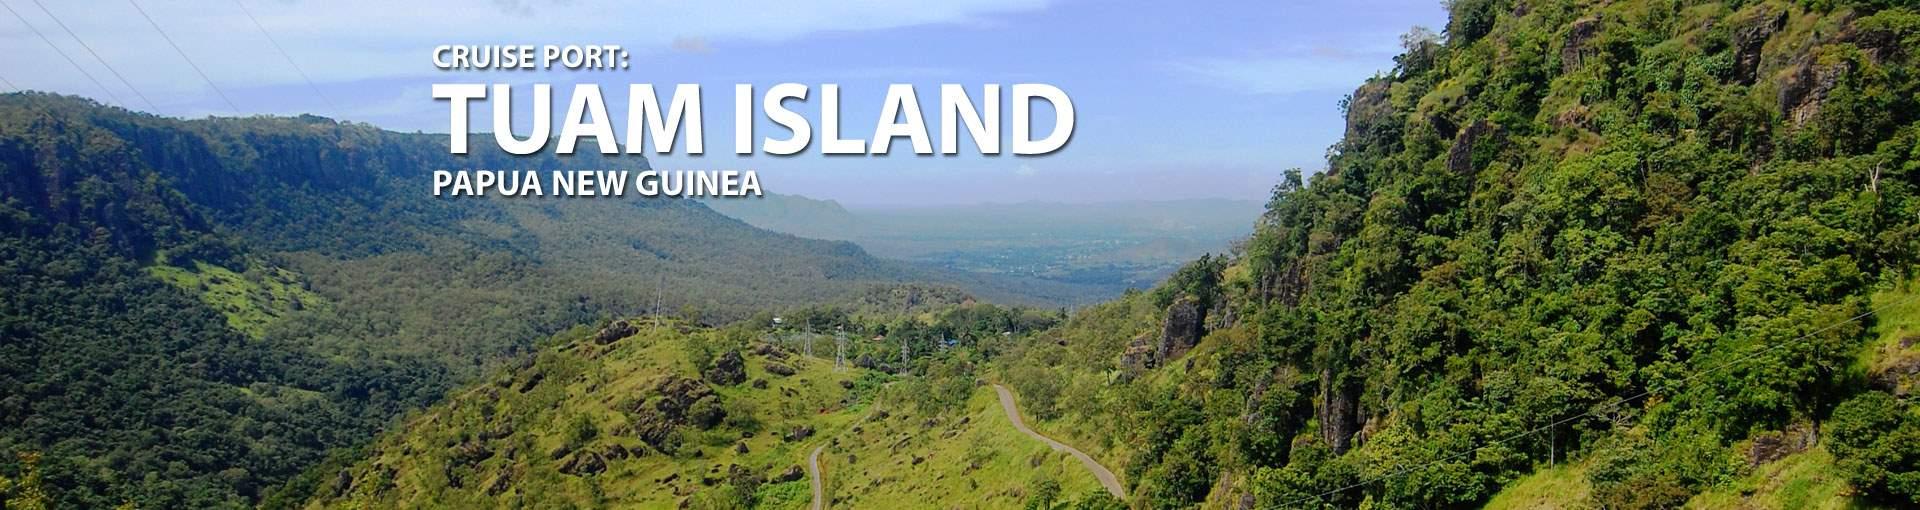 Cruises to Tuam Island, Papua New Guinea